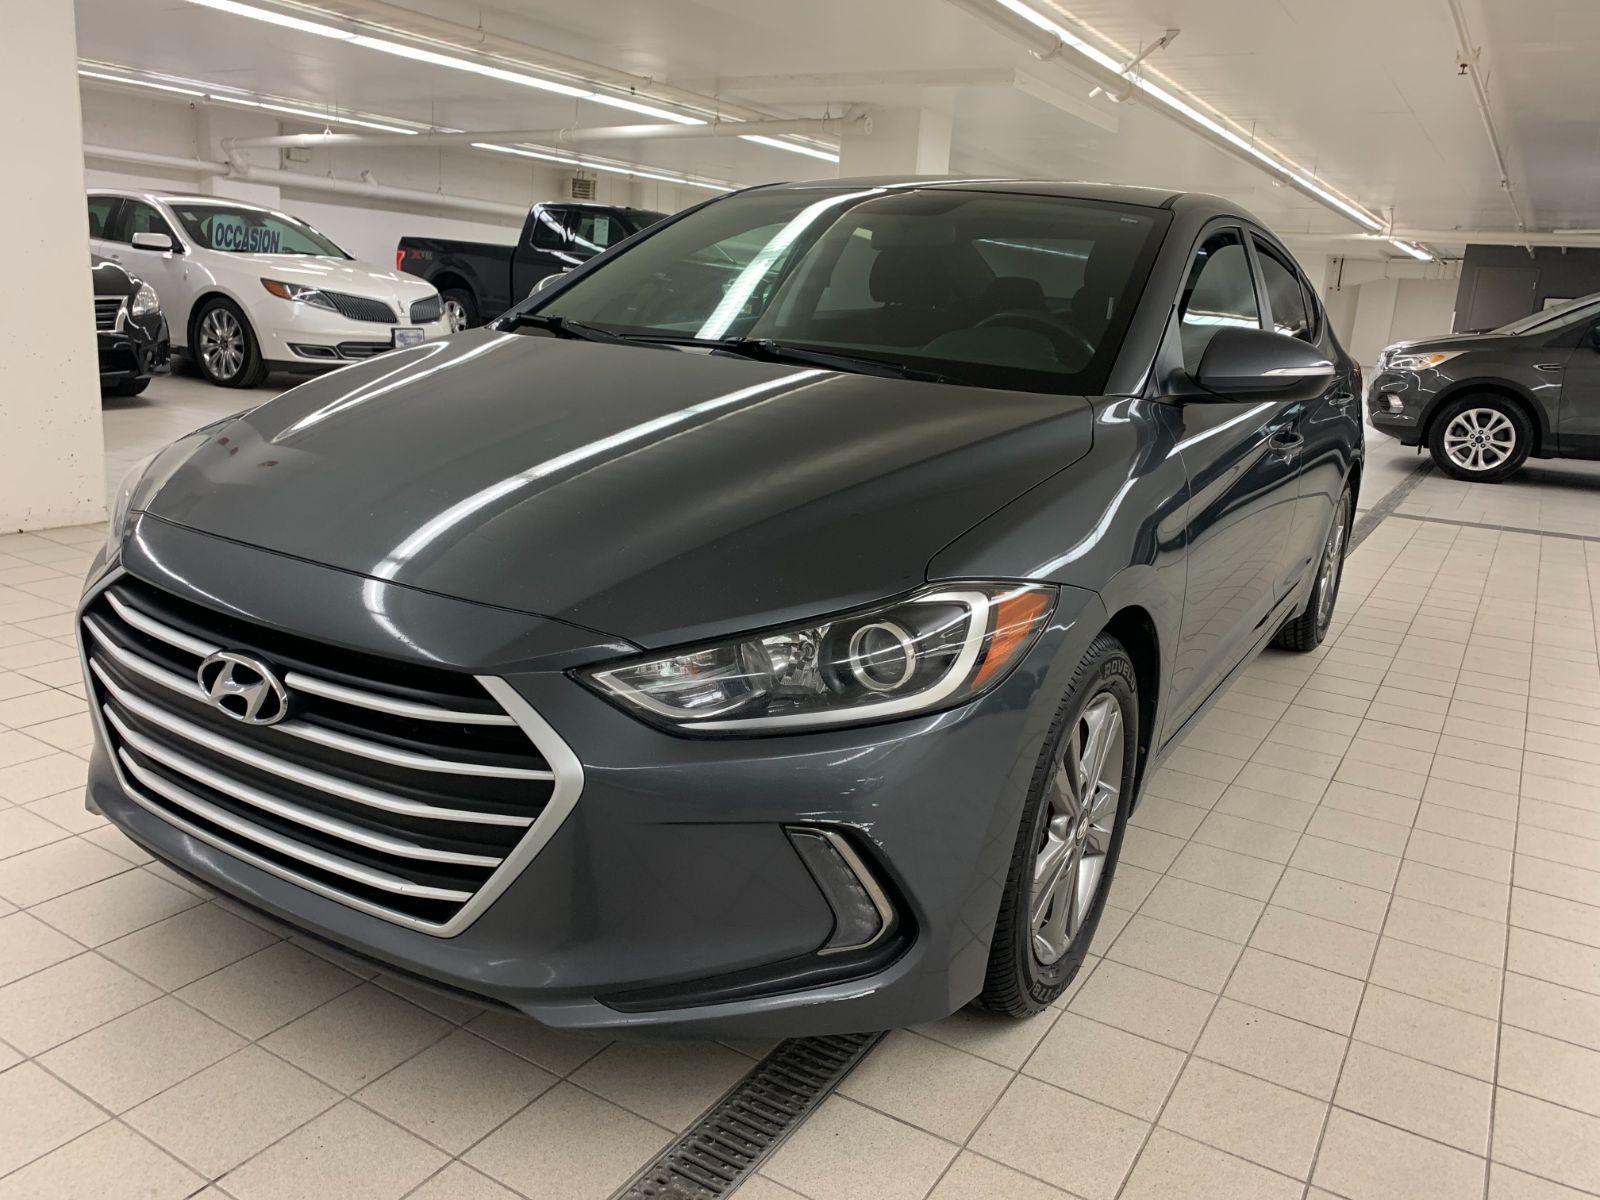 2017 Hyundai Elantra complet